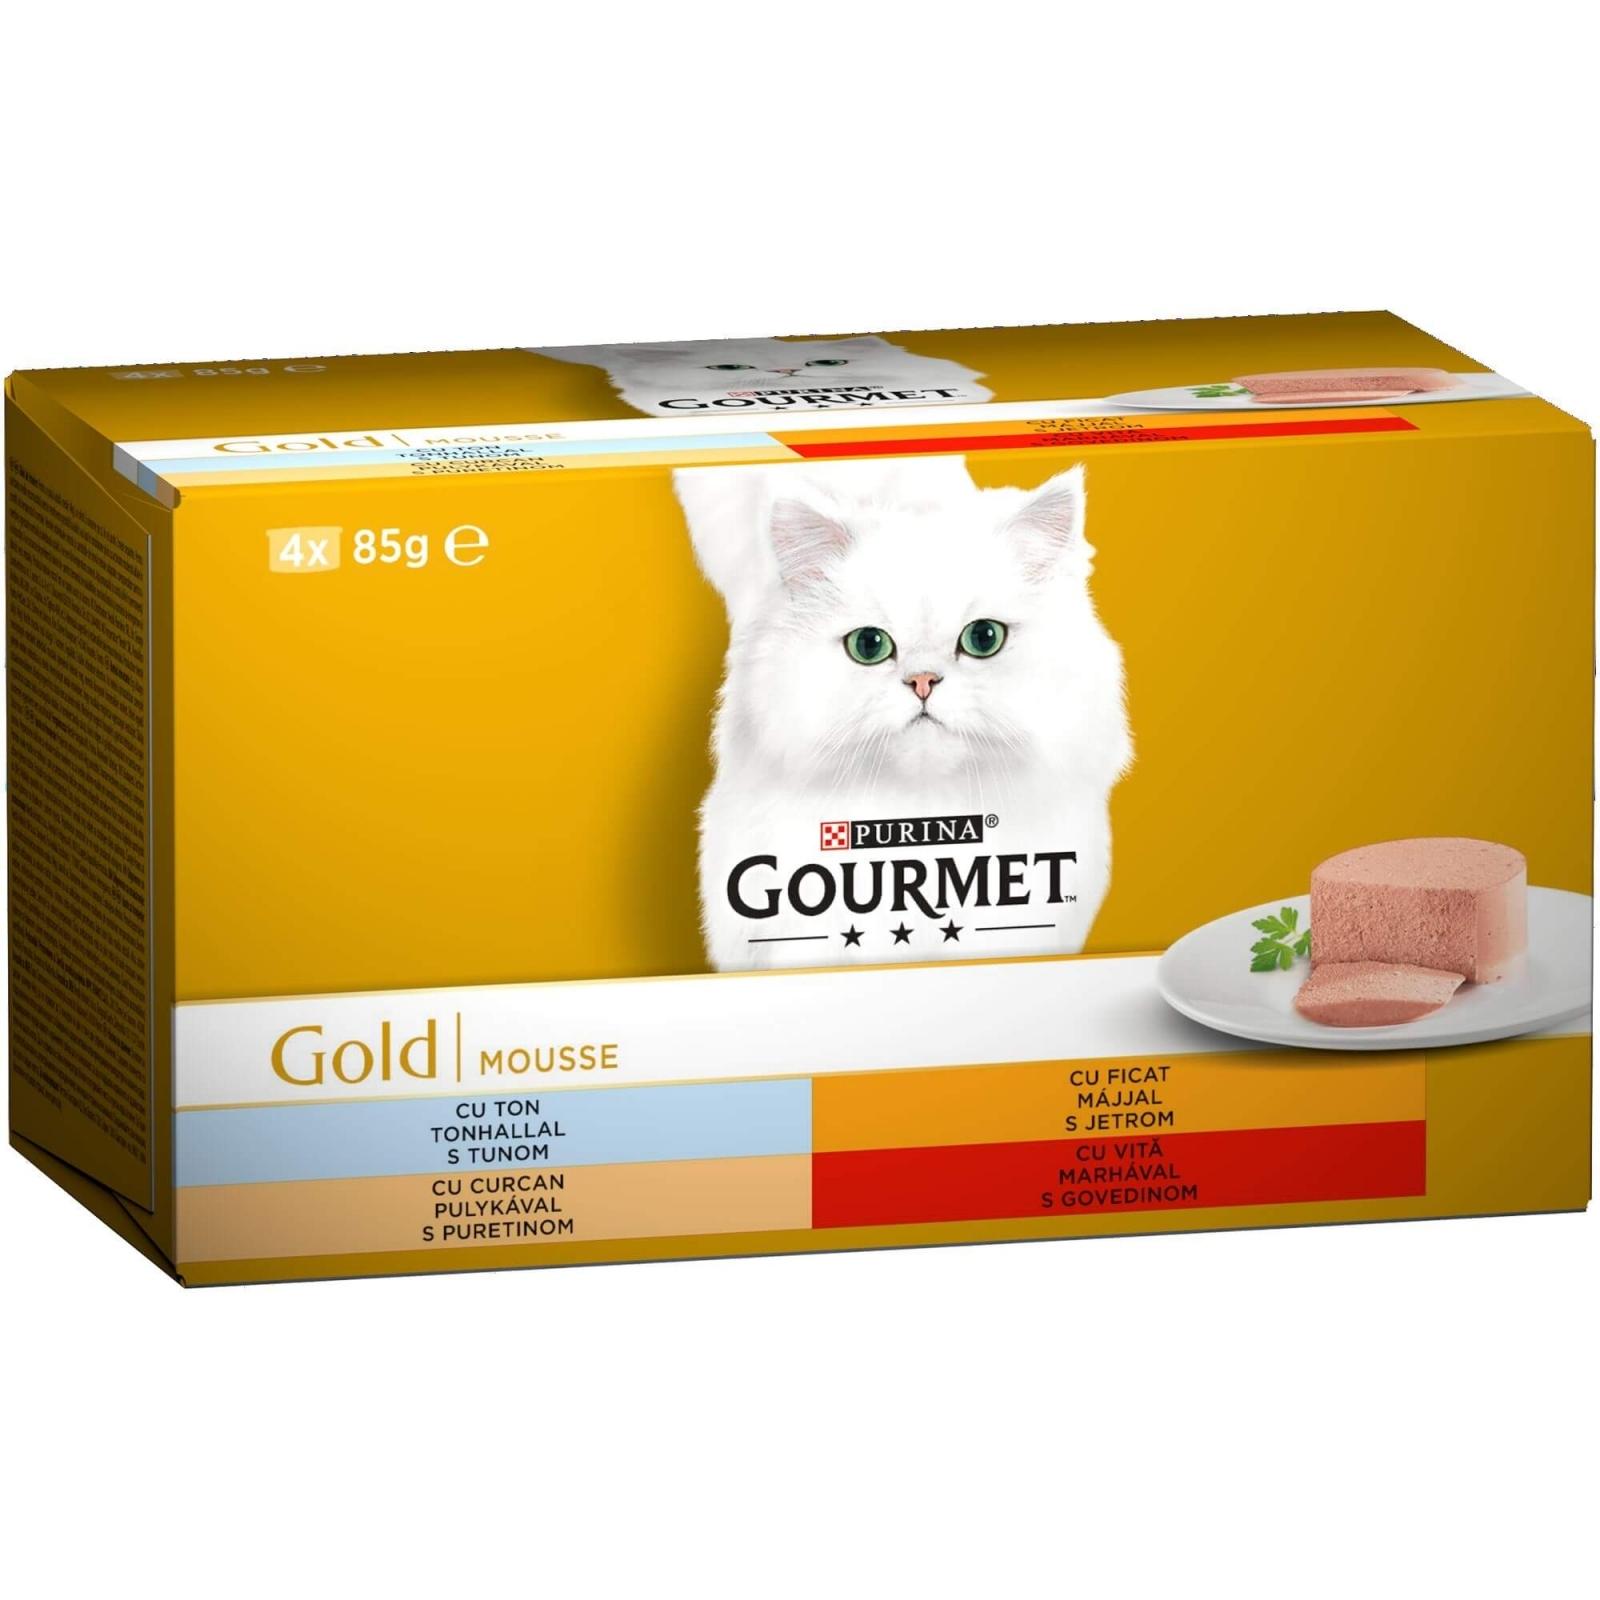 Gourmet Gold Mousse Vita, Curcan, Ficat si Ton, 4 x 85 g imagine